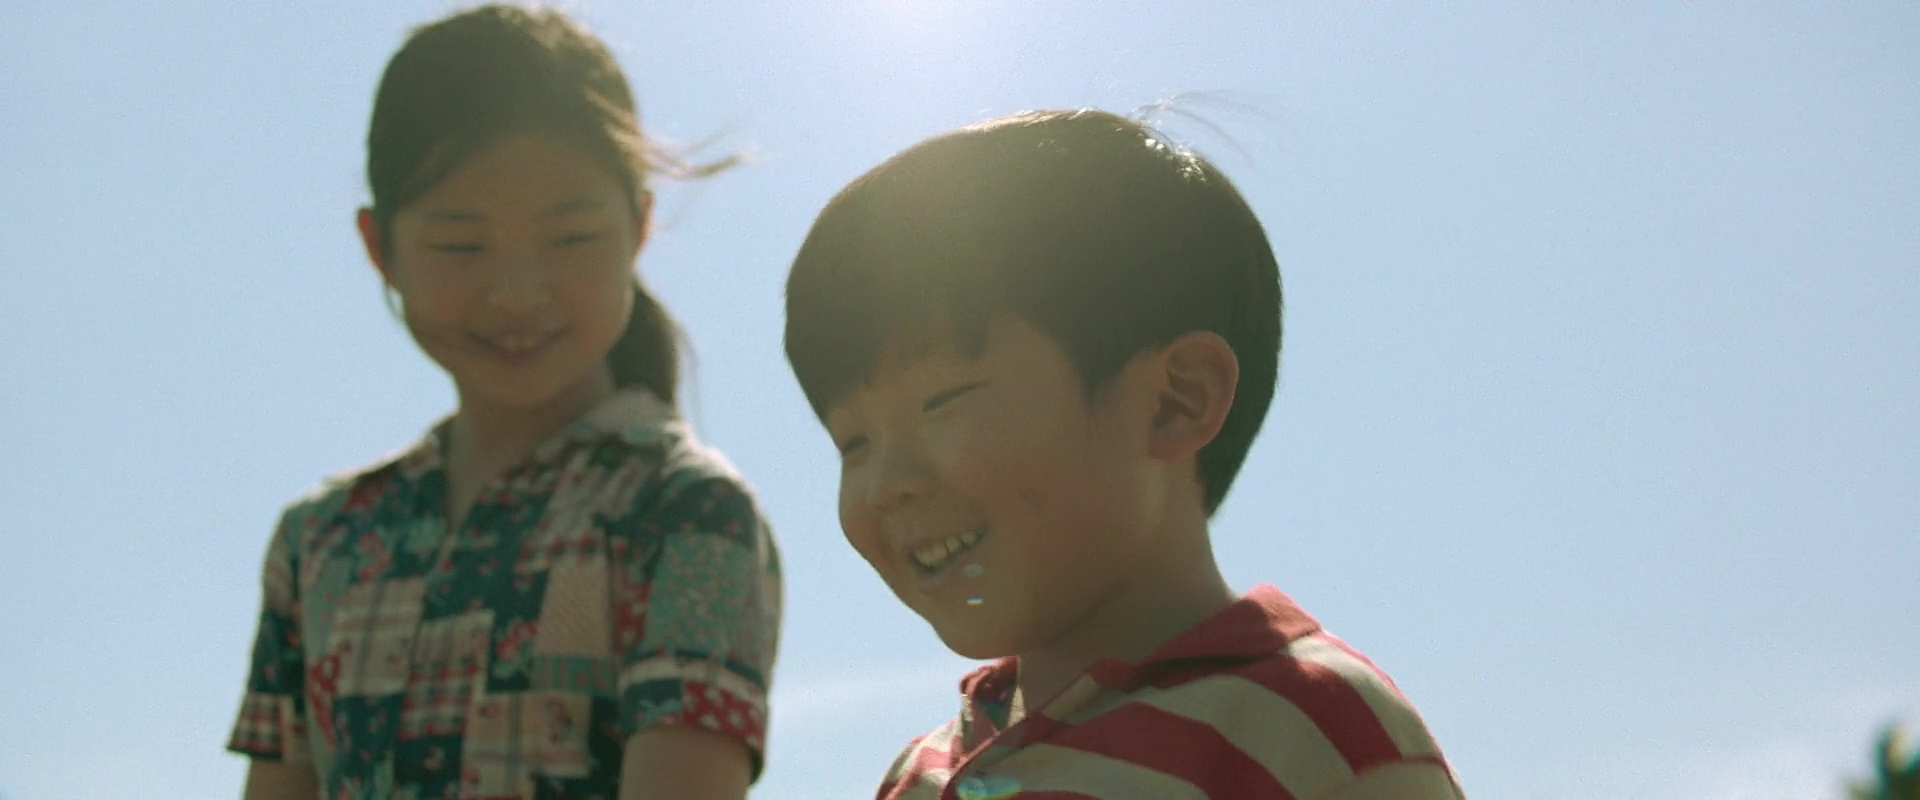 Minari Oscar Nominated Film Review